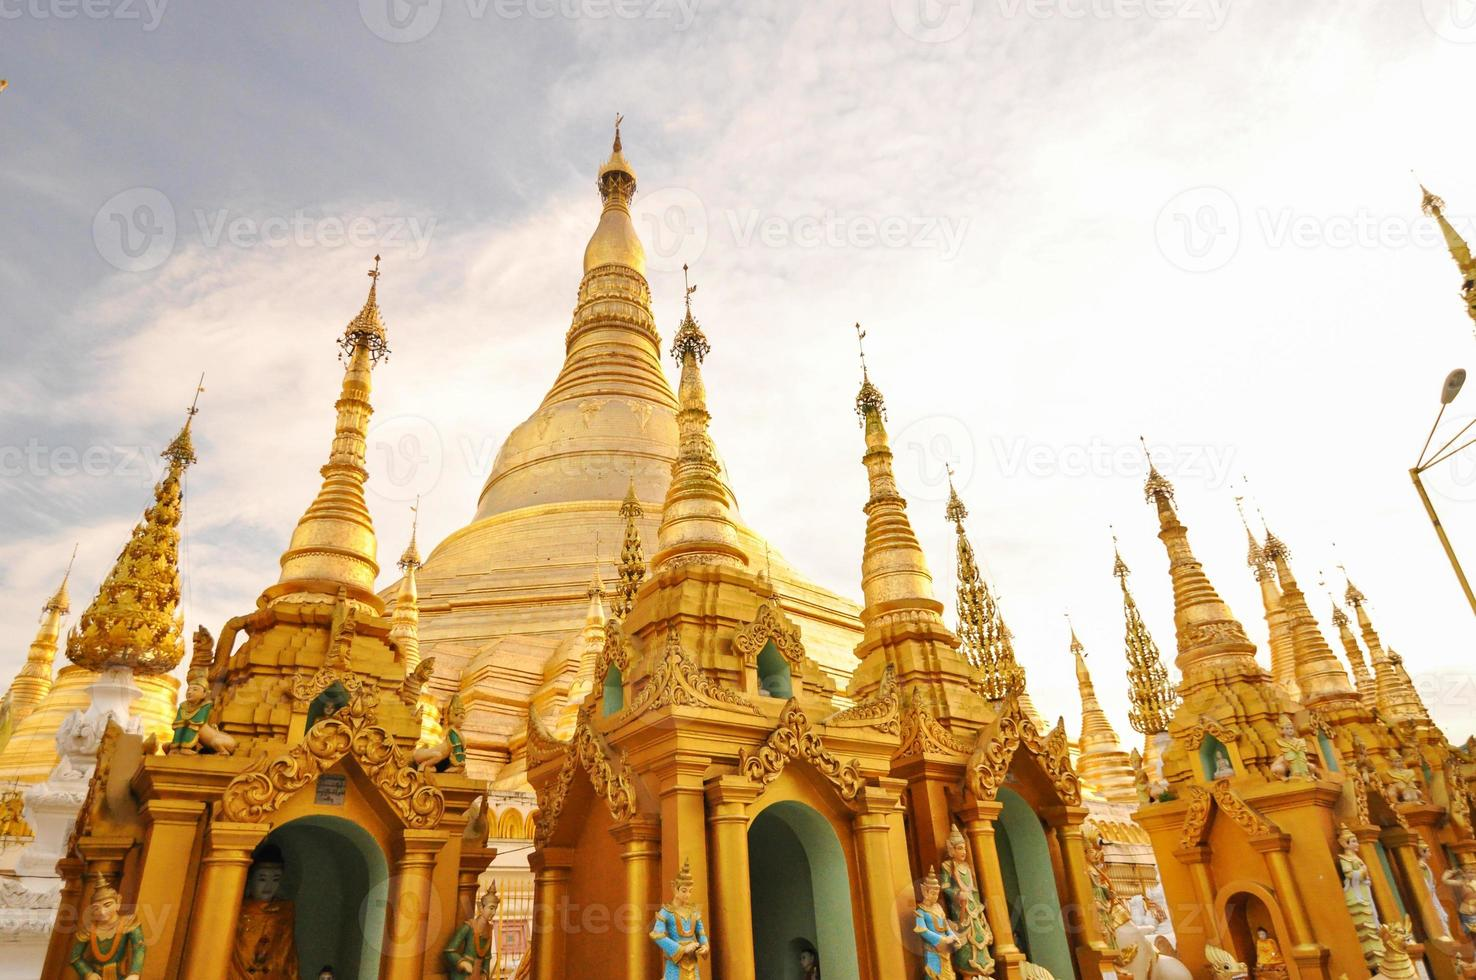 shwedagon paya em yangon, myanmar foto